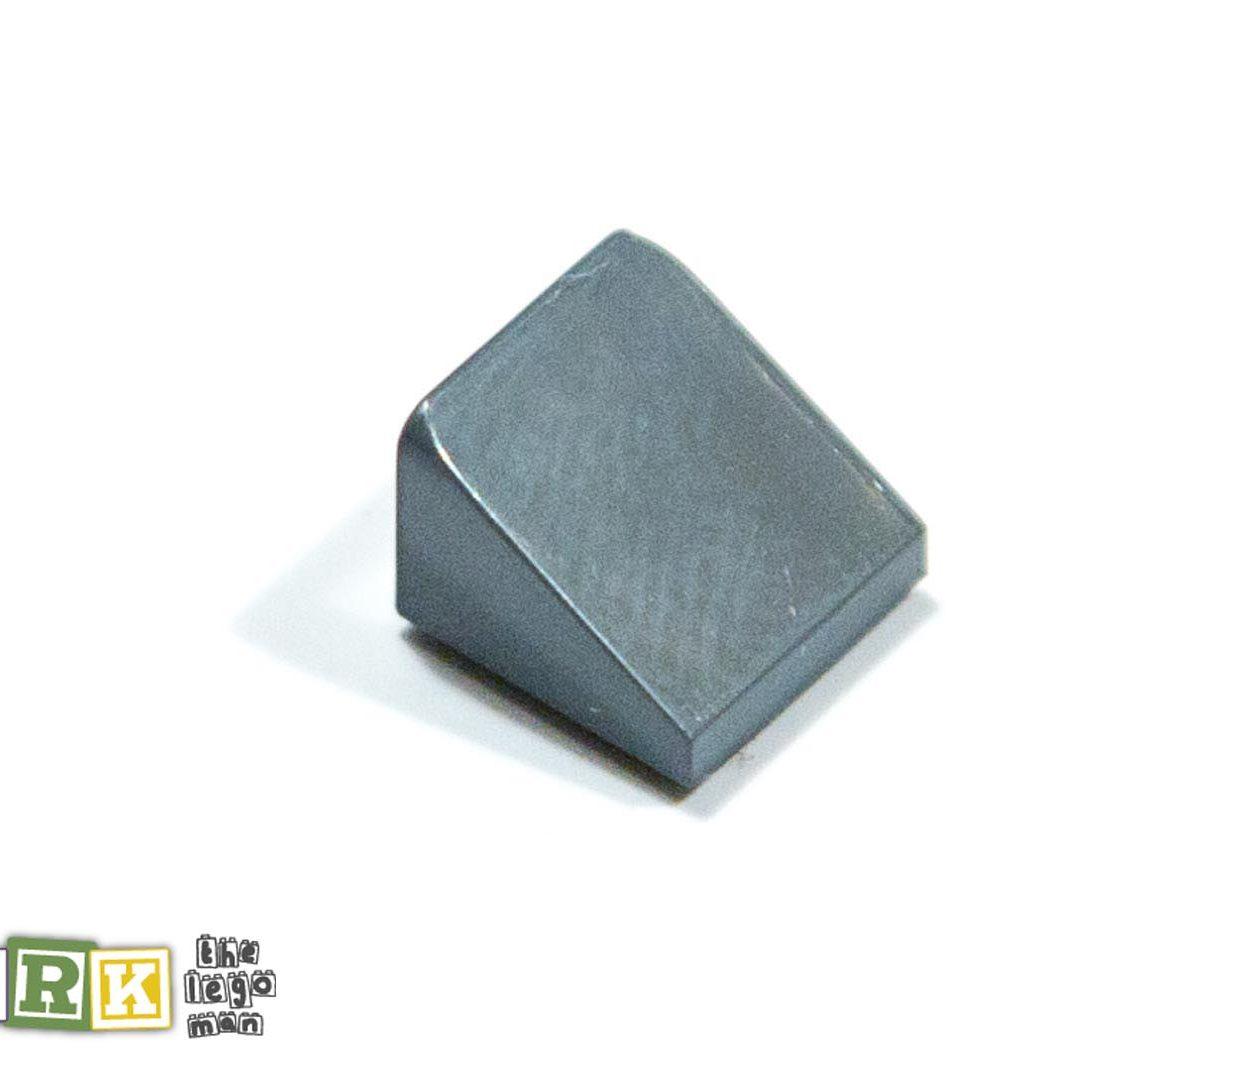 Lego 4504378 54200 1x Dark Blueish Grey Dark Stone Dark Standard Grey 1X1x2 3 Roof Tile